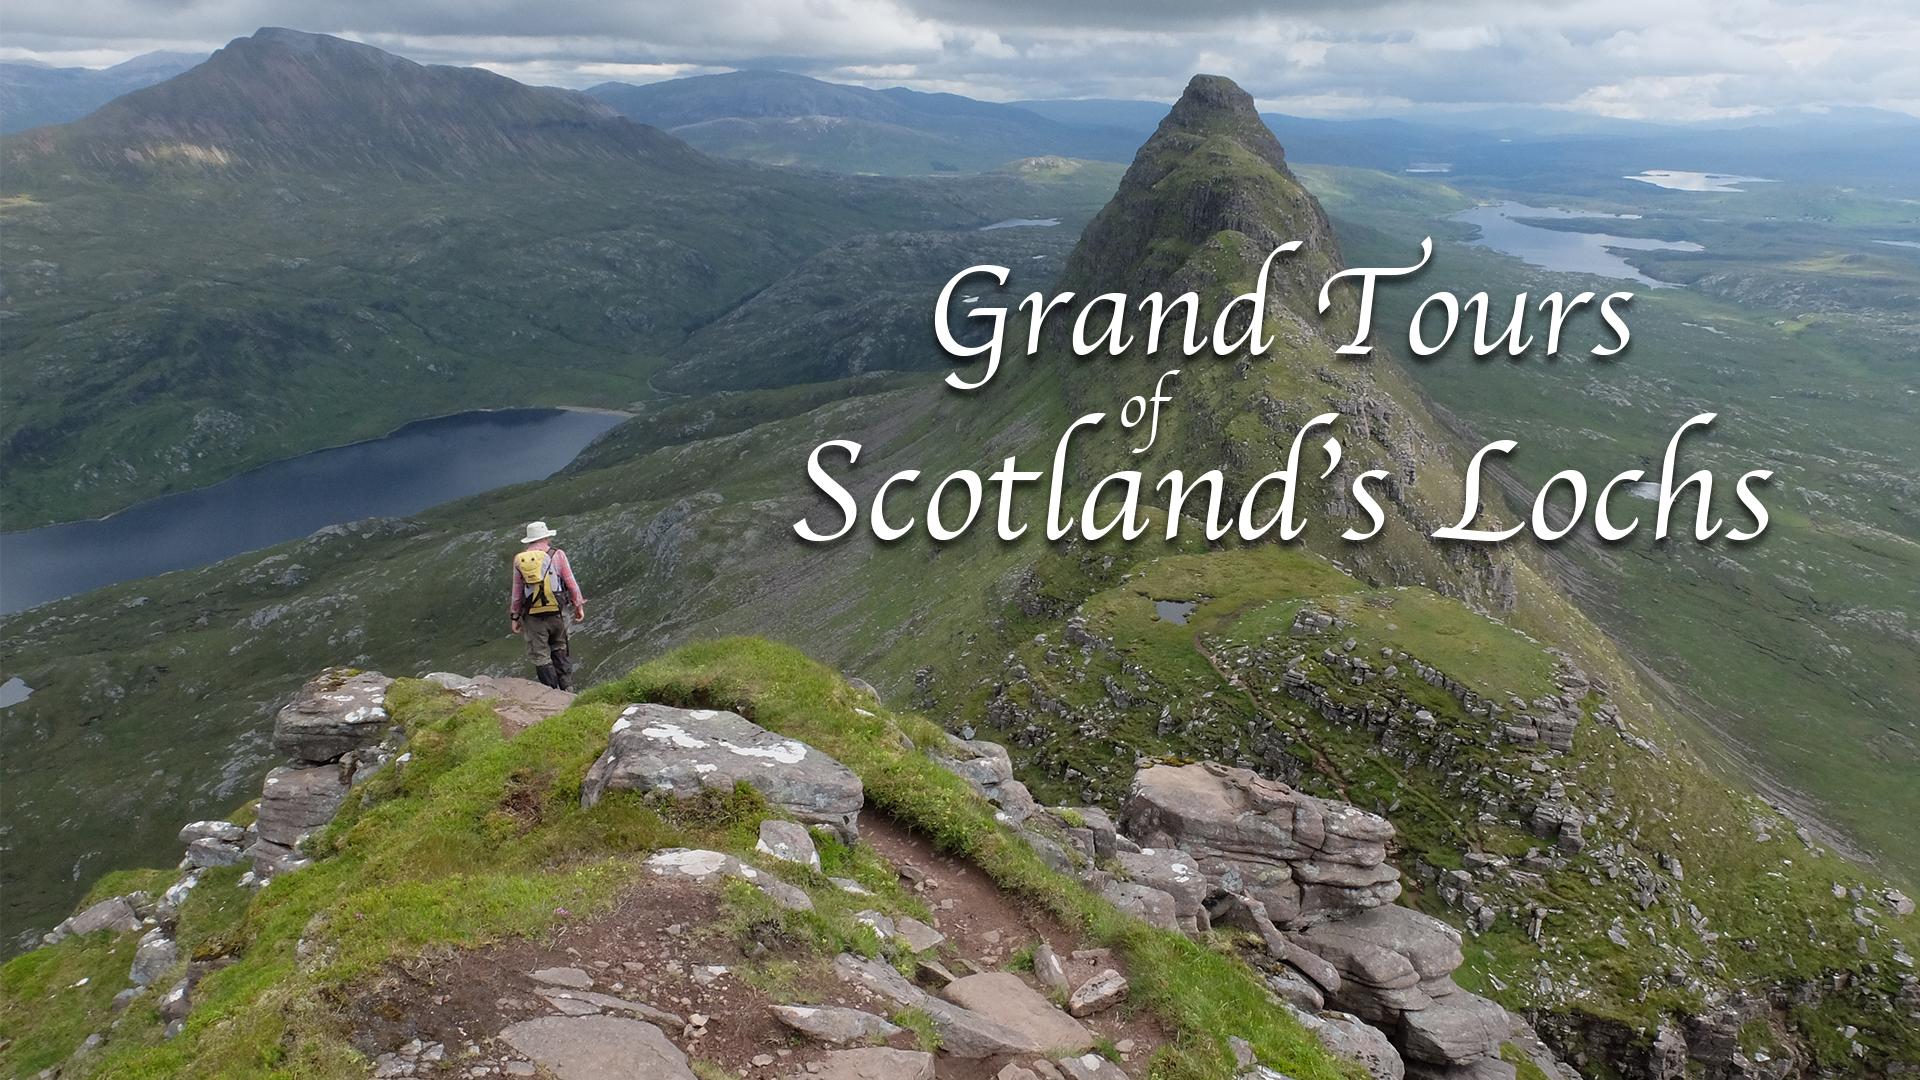 Grand Tours of Scotland's Lochs